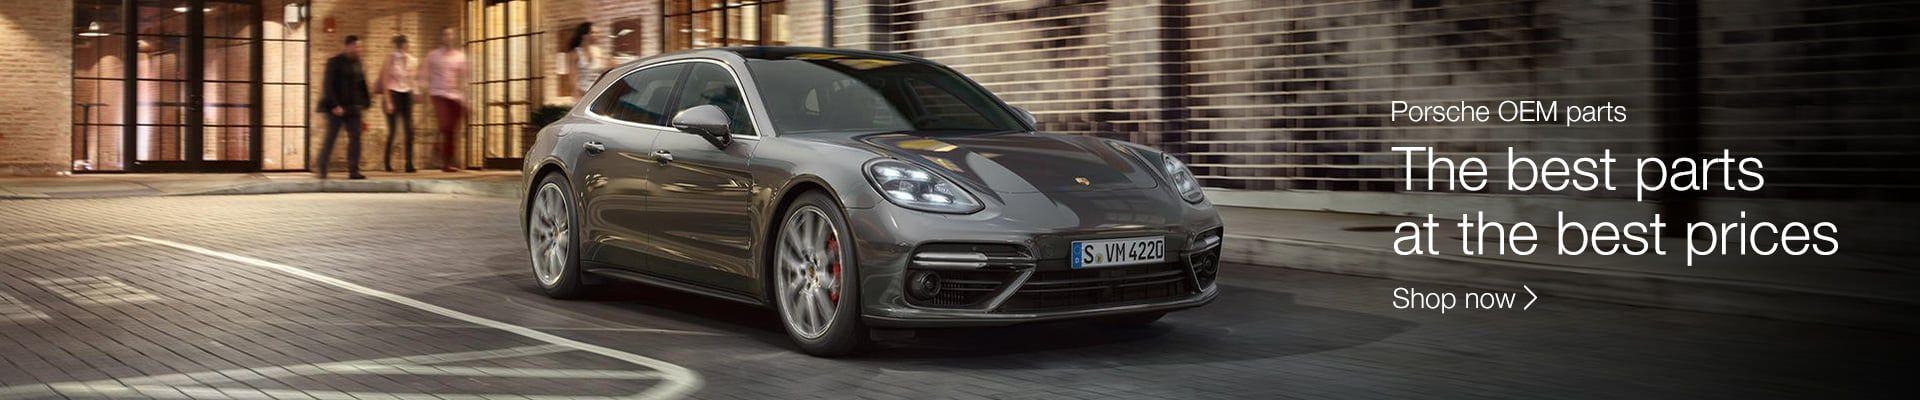 Porsche OEM Parts